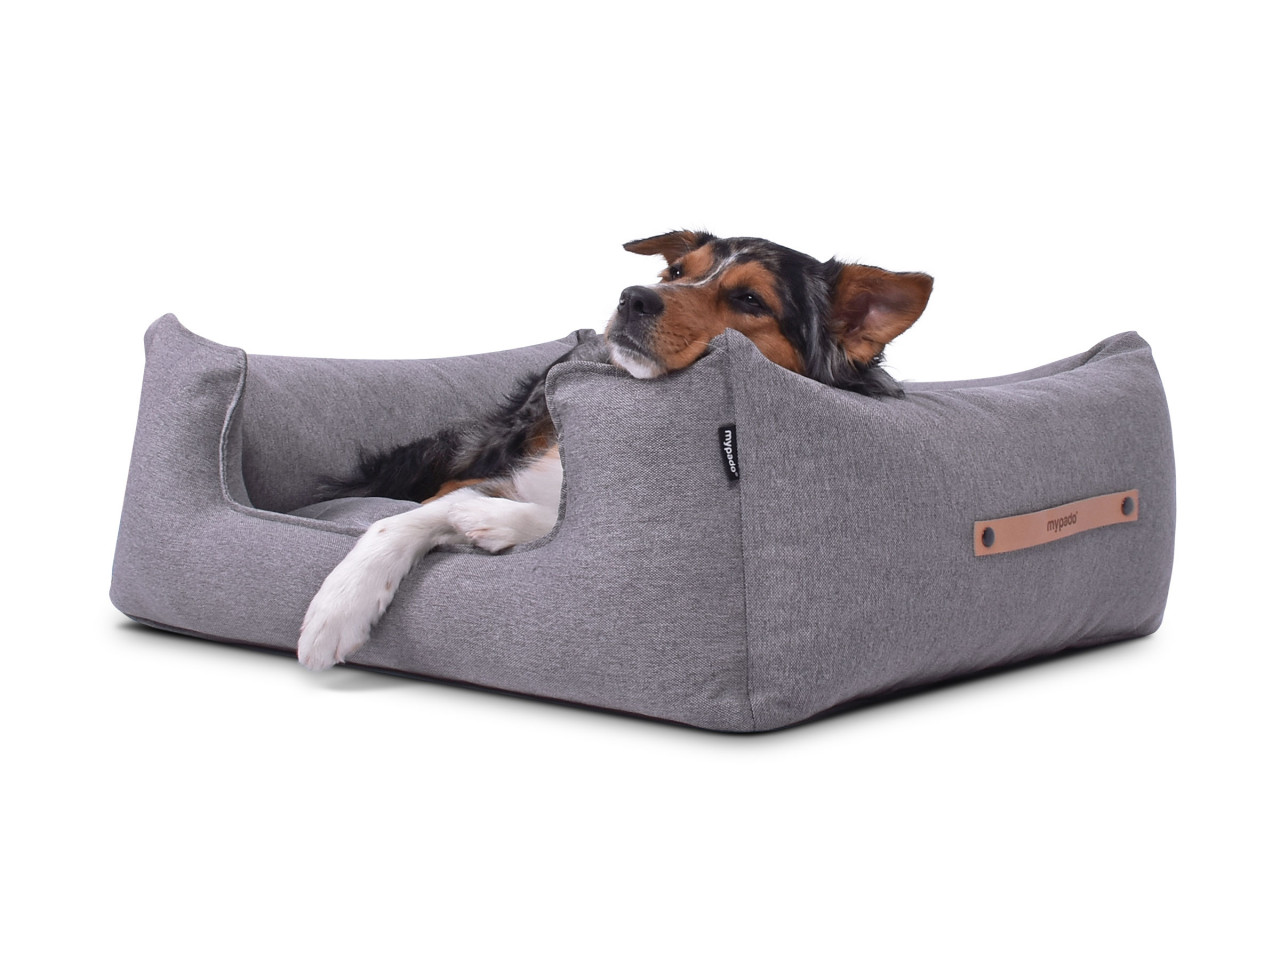 hundebett-NORDIC-basic-grey-hund2